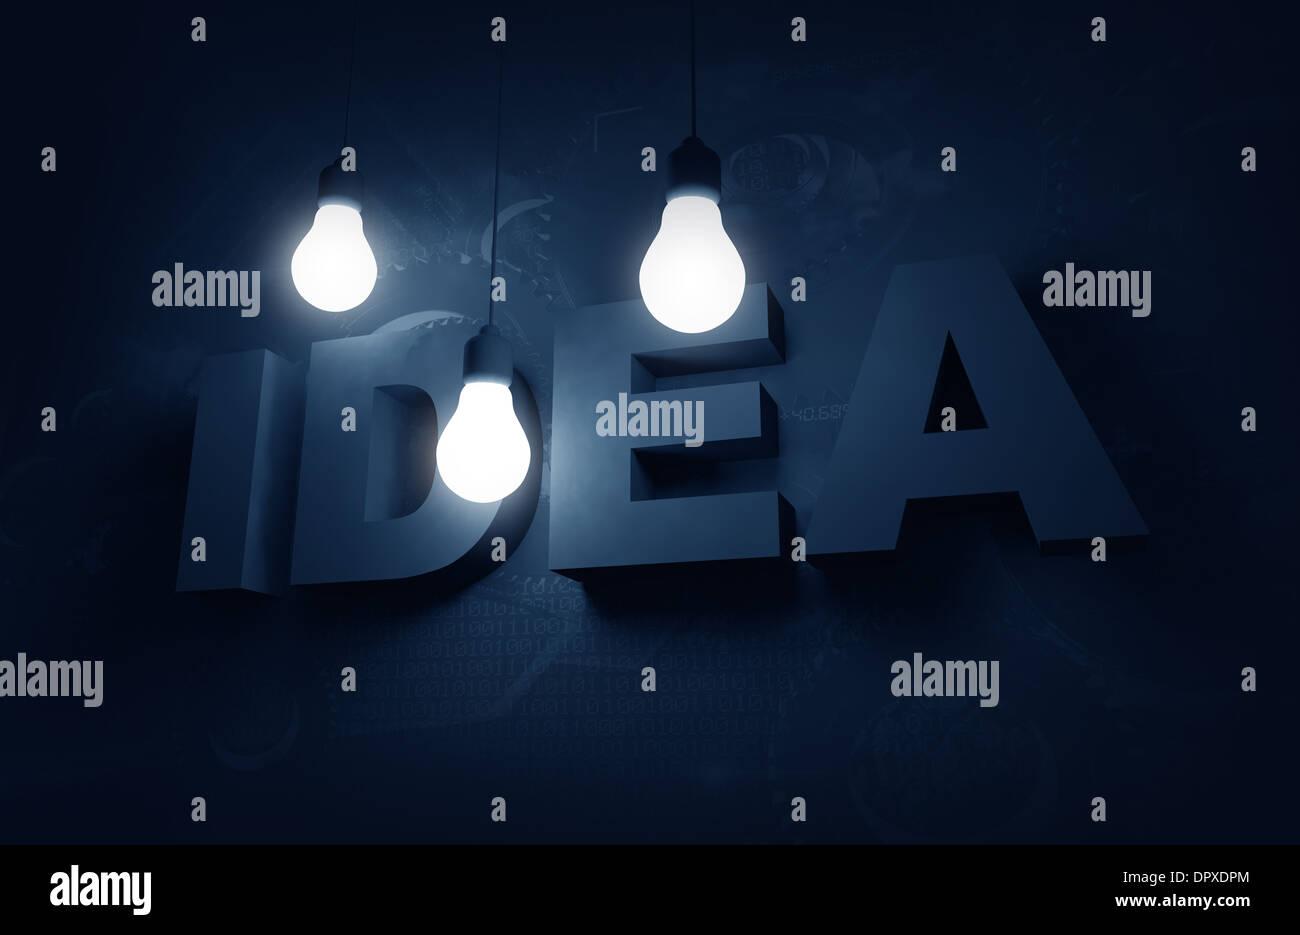 Idea Concept Illustration with Hanging Bulbs Illuminating Idea 3D Word. Blue Tones. - Stock Image